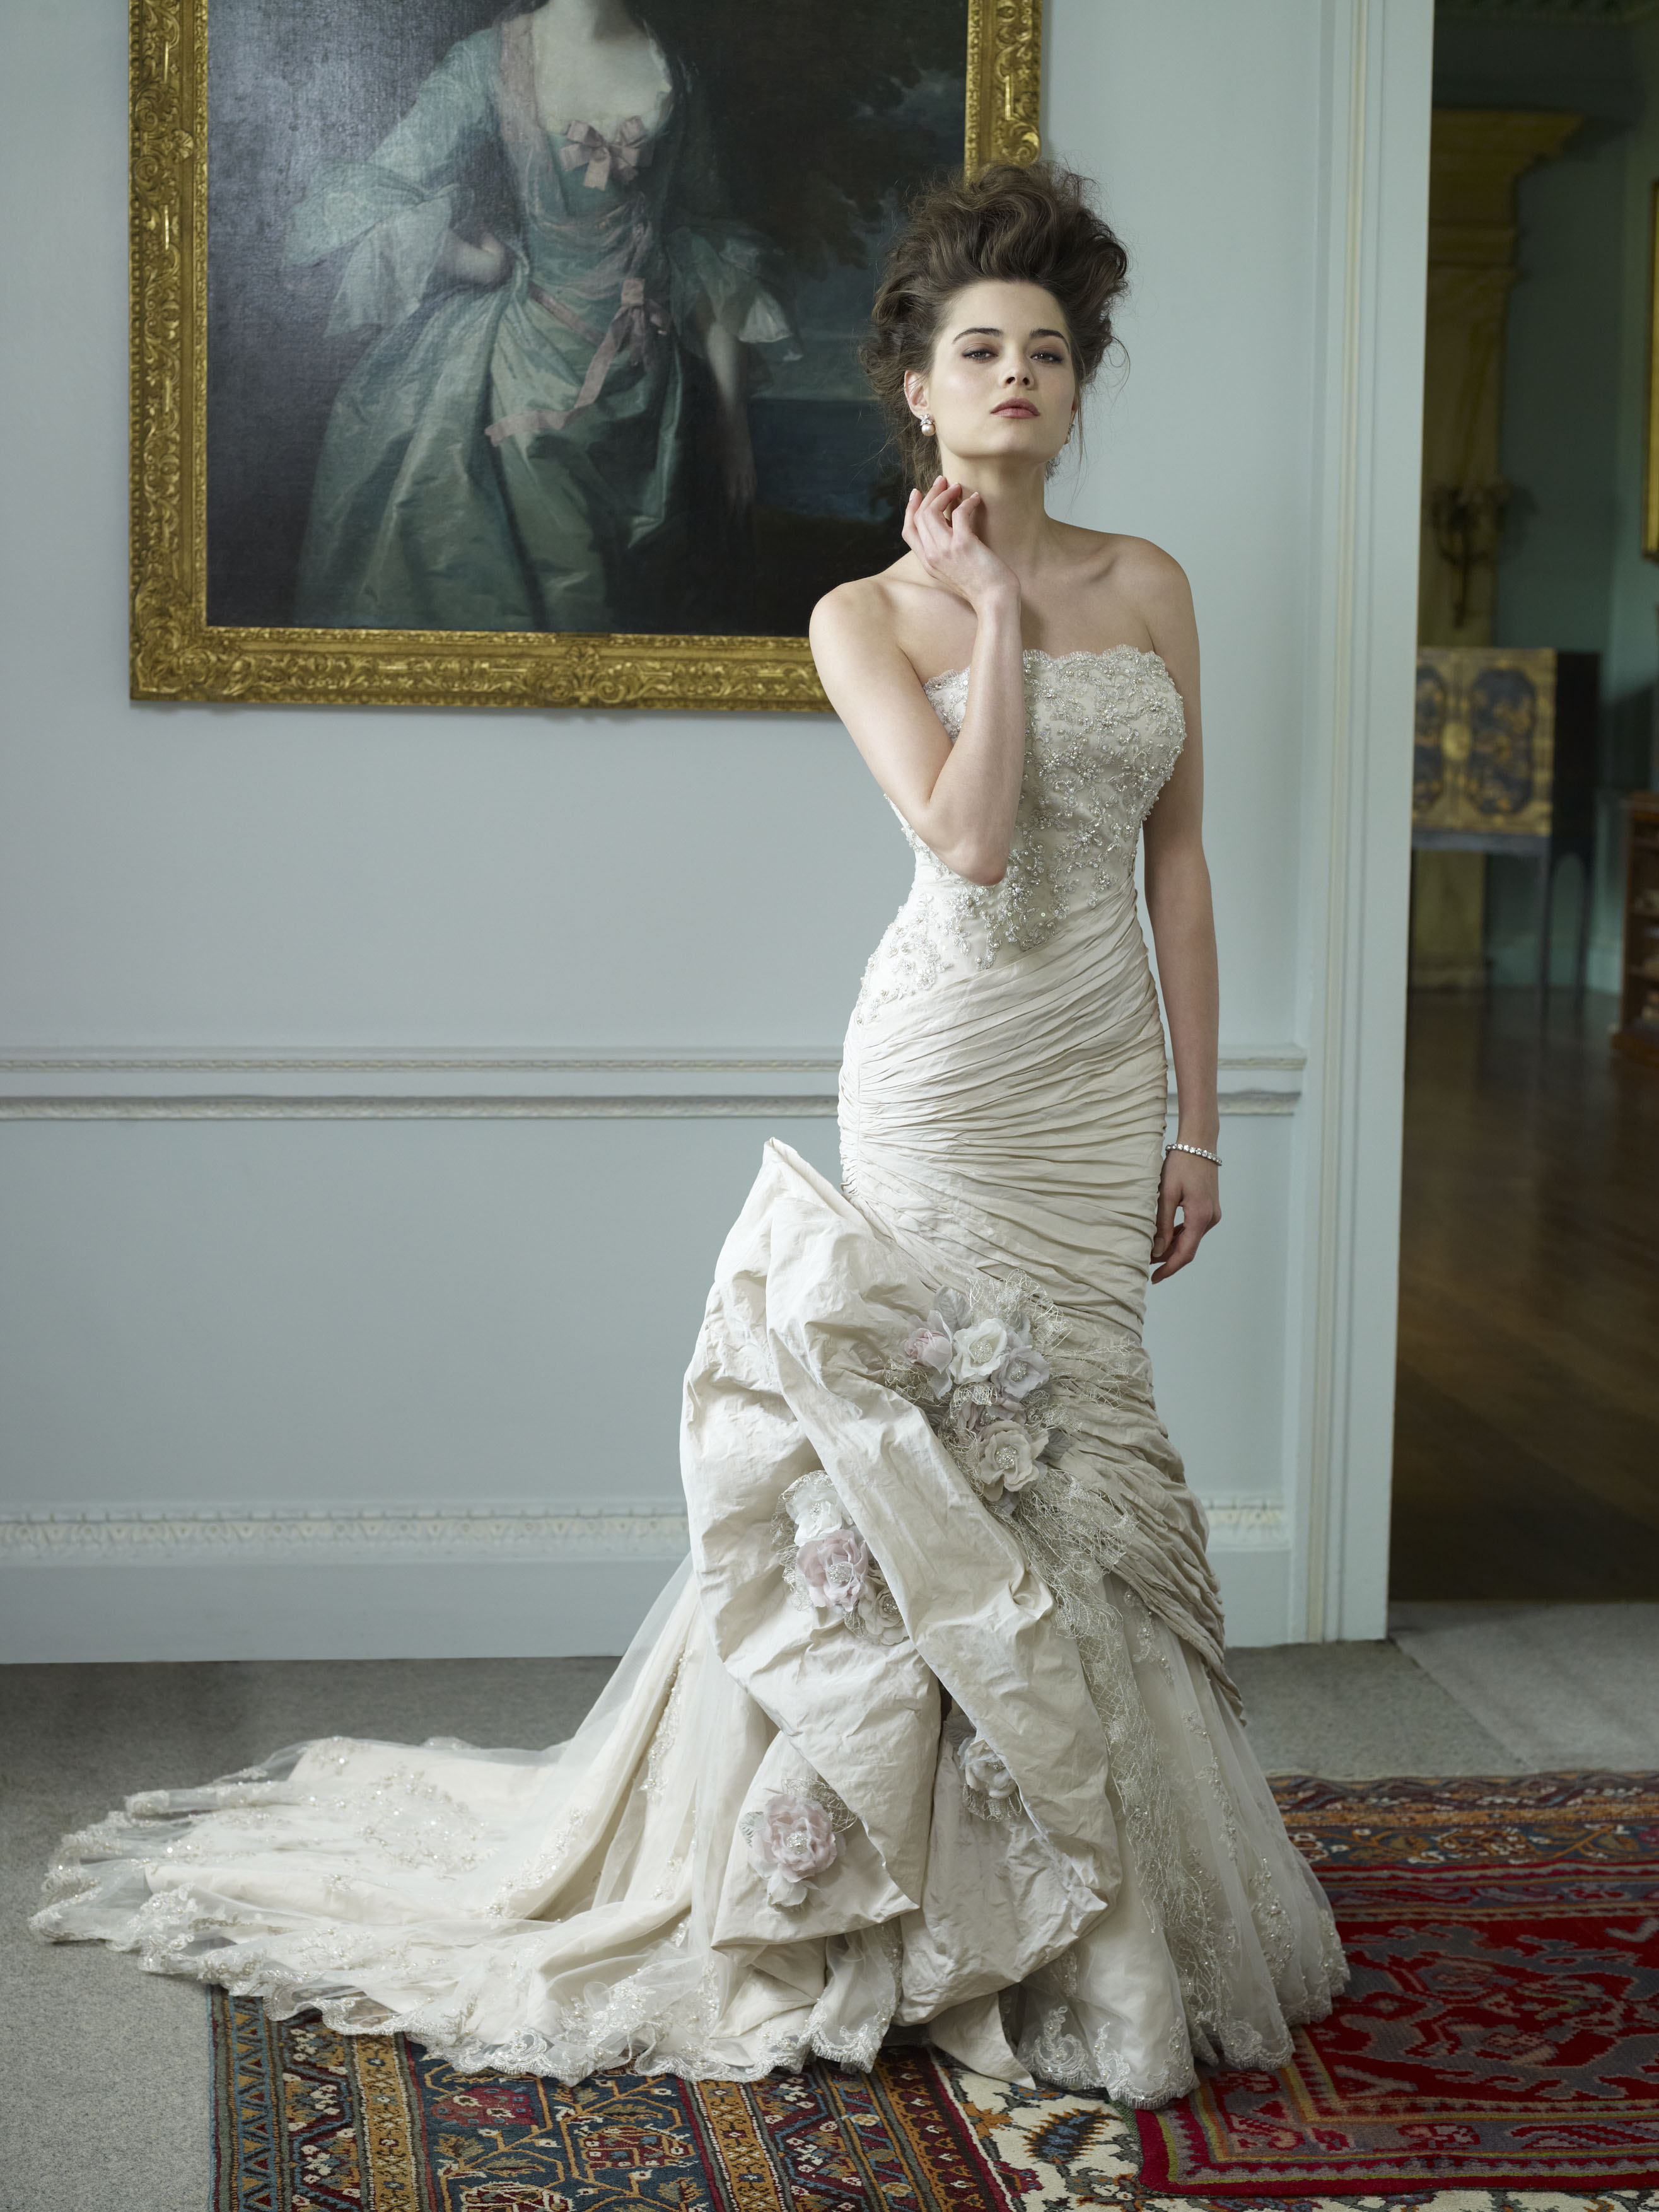 ian stuart wedding dresses photo - 1